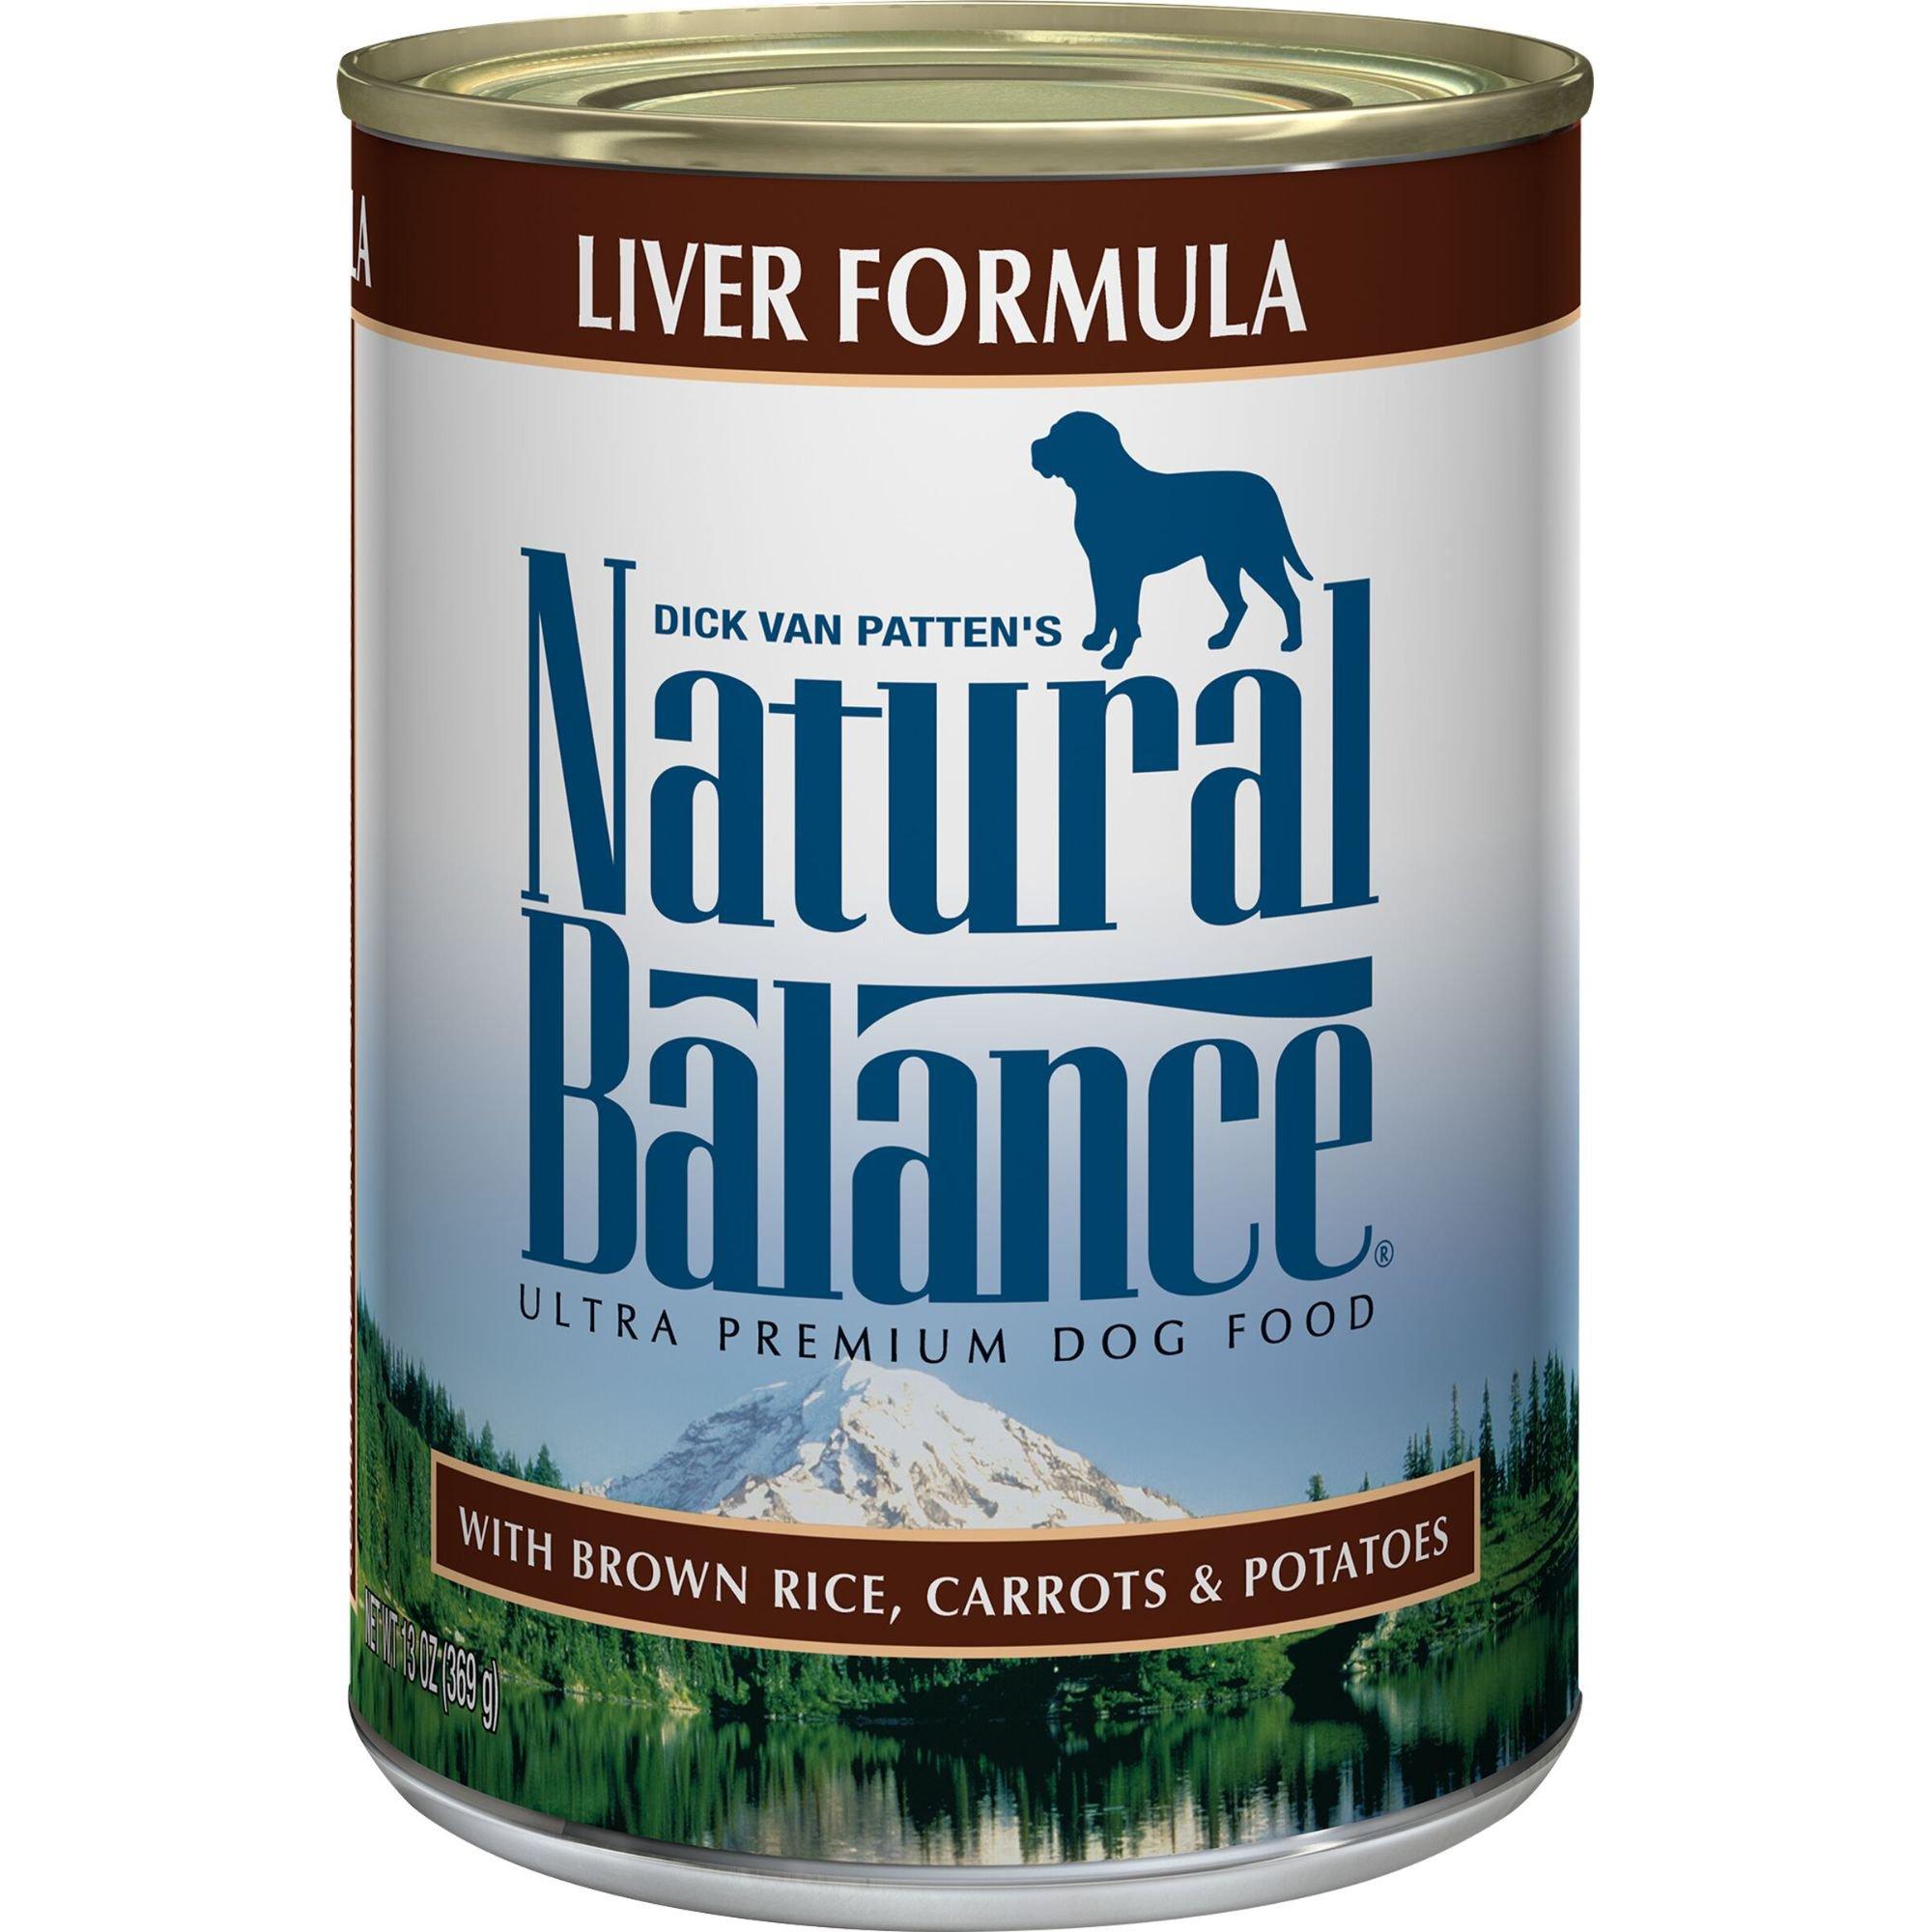 Natural Balance Ultra Premium Liver Formula Canned Dog Food